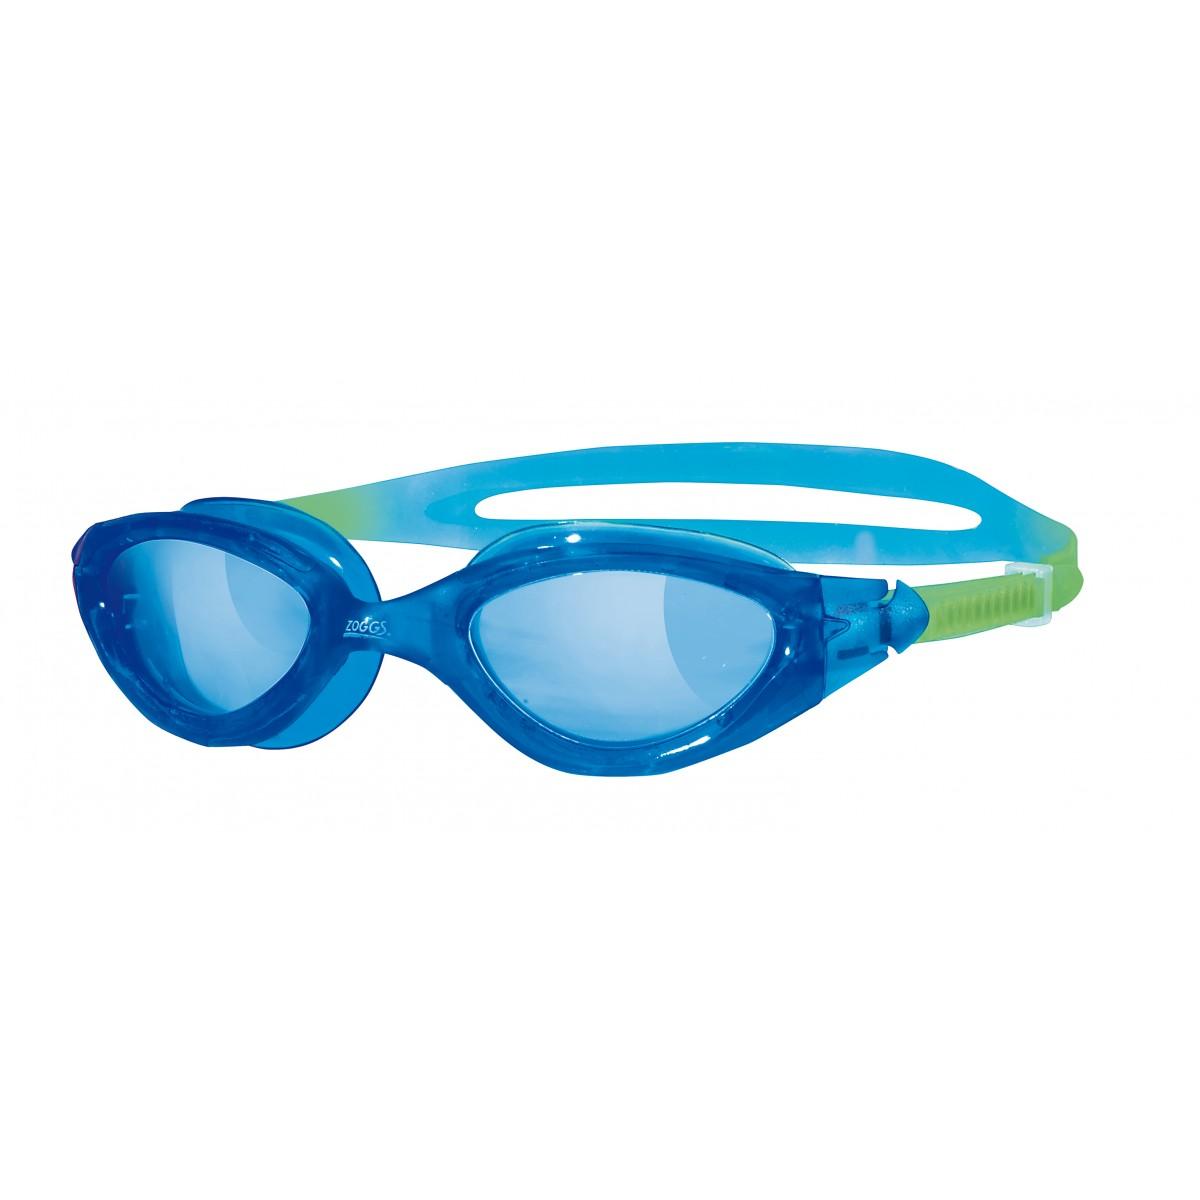 Zoggs Panorama Junior Swimming Goggles  Blue